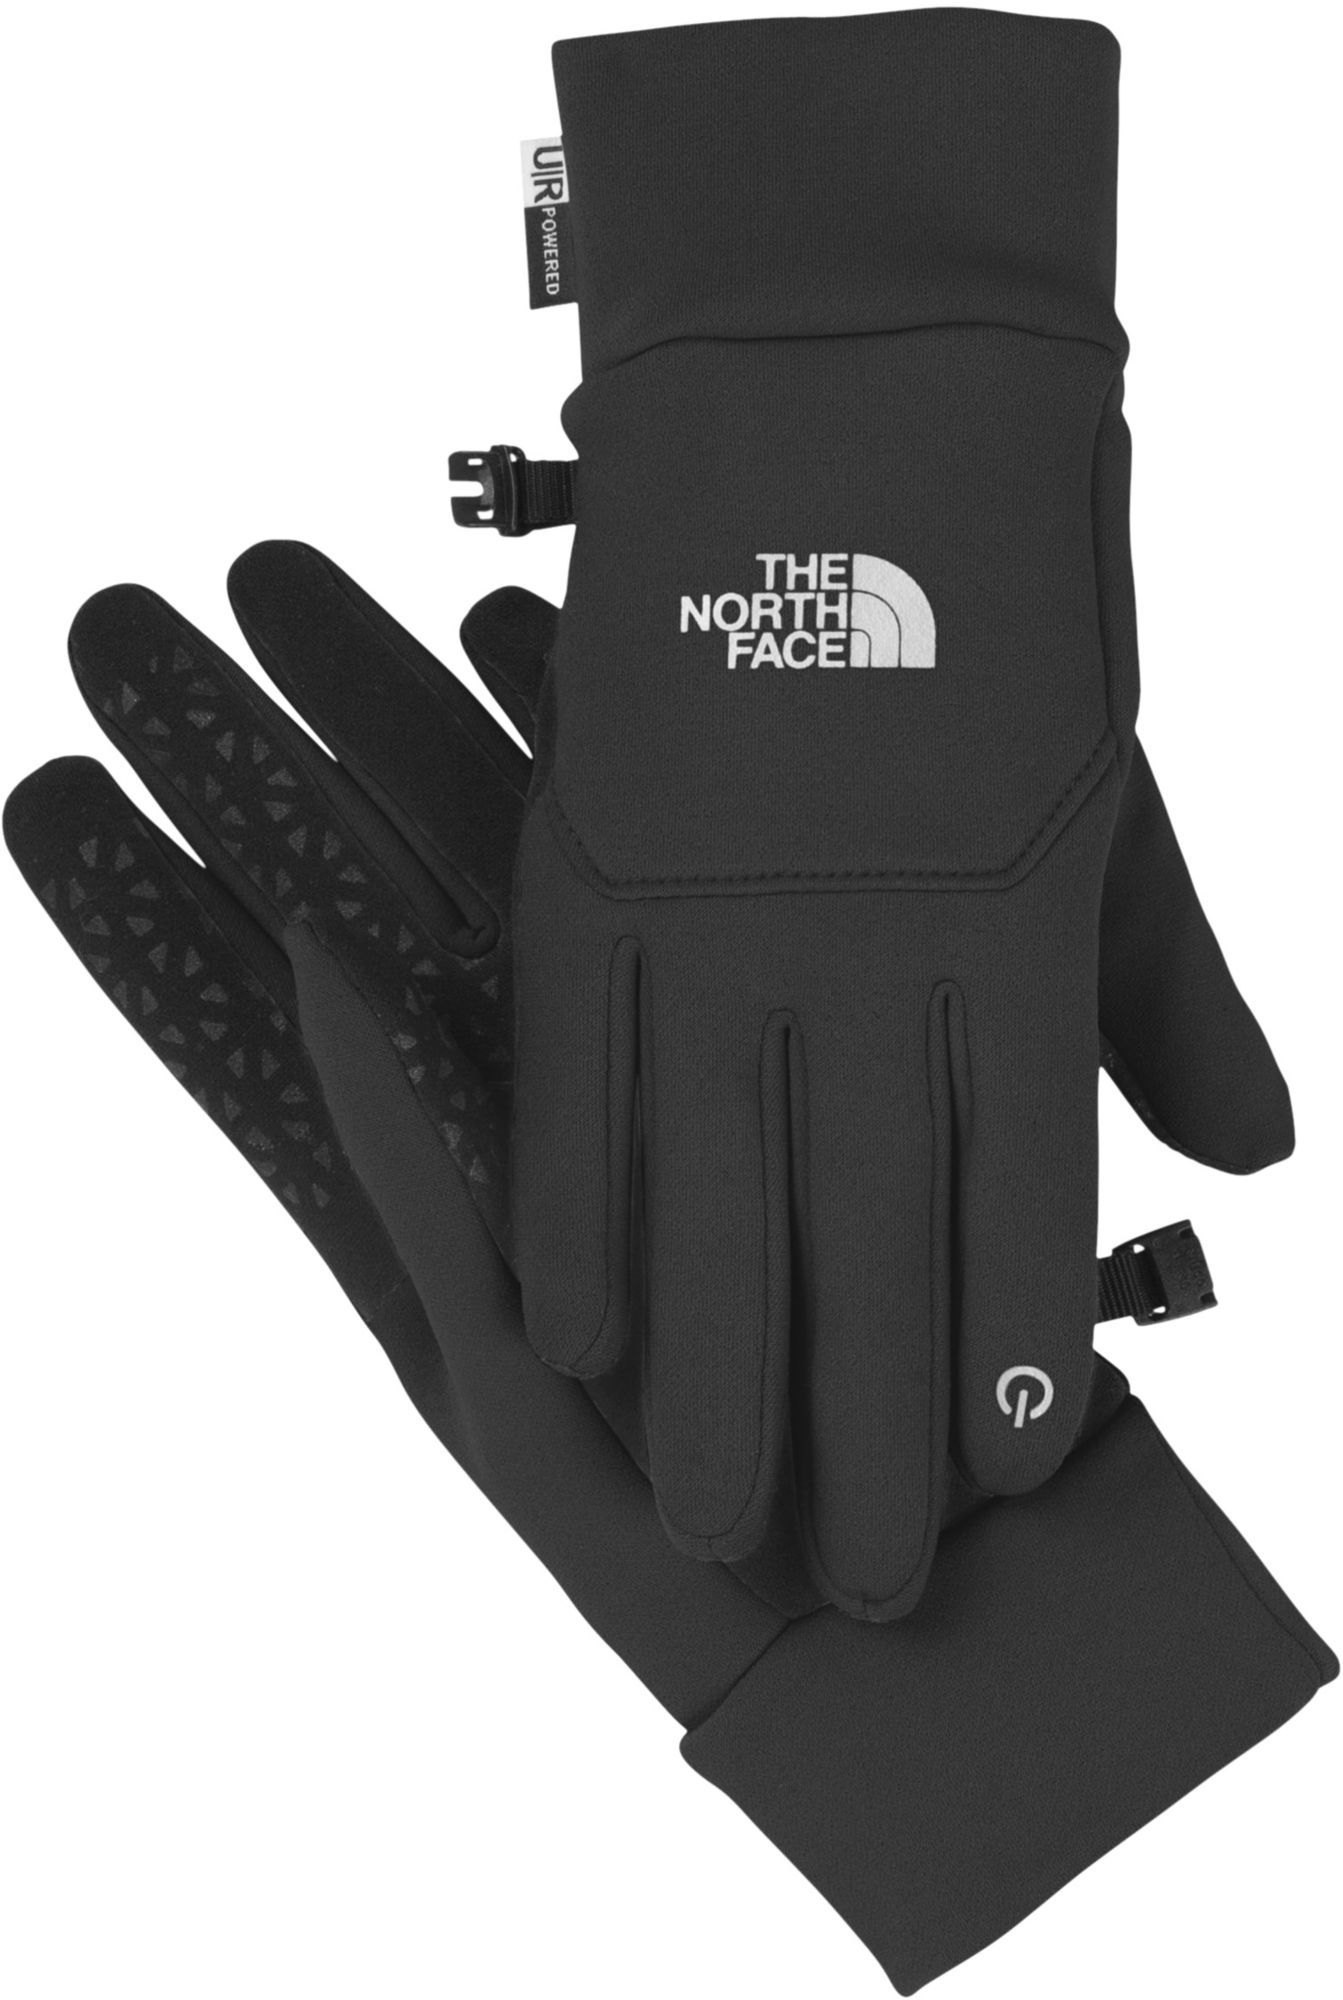 The North Face Women's Etip Gloves, Size Medium, Black